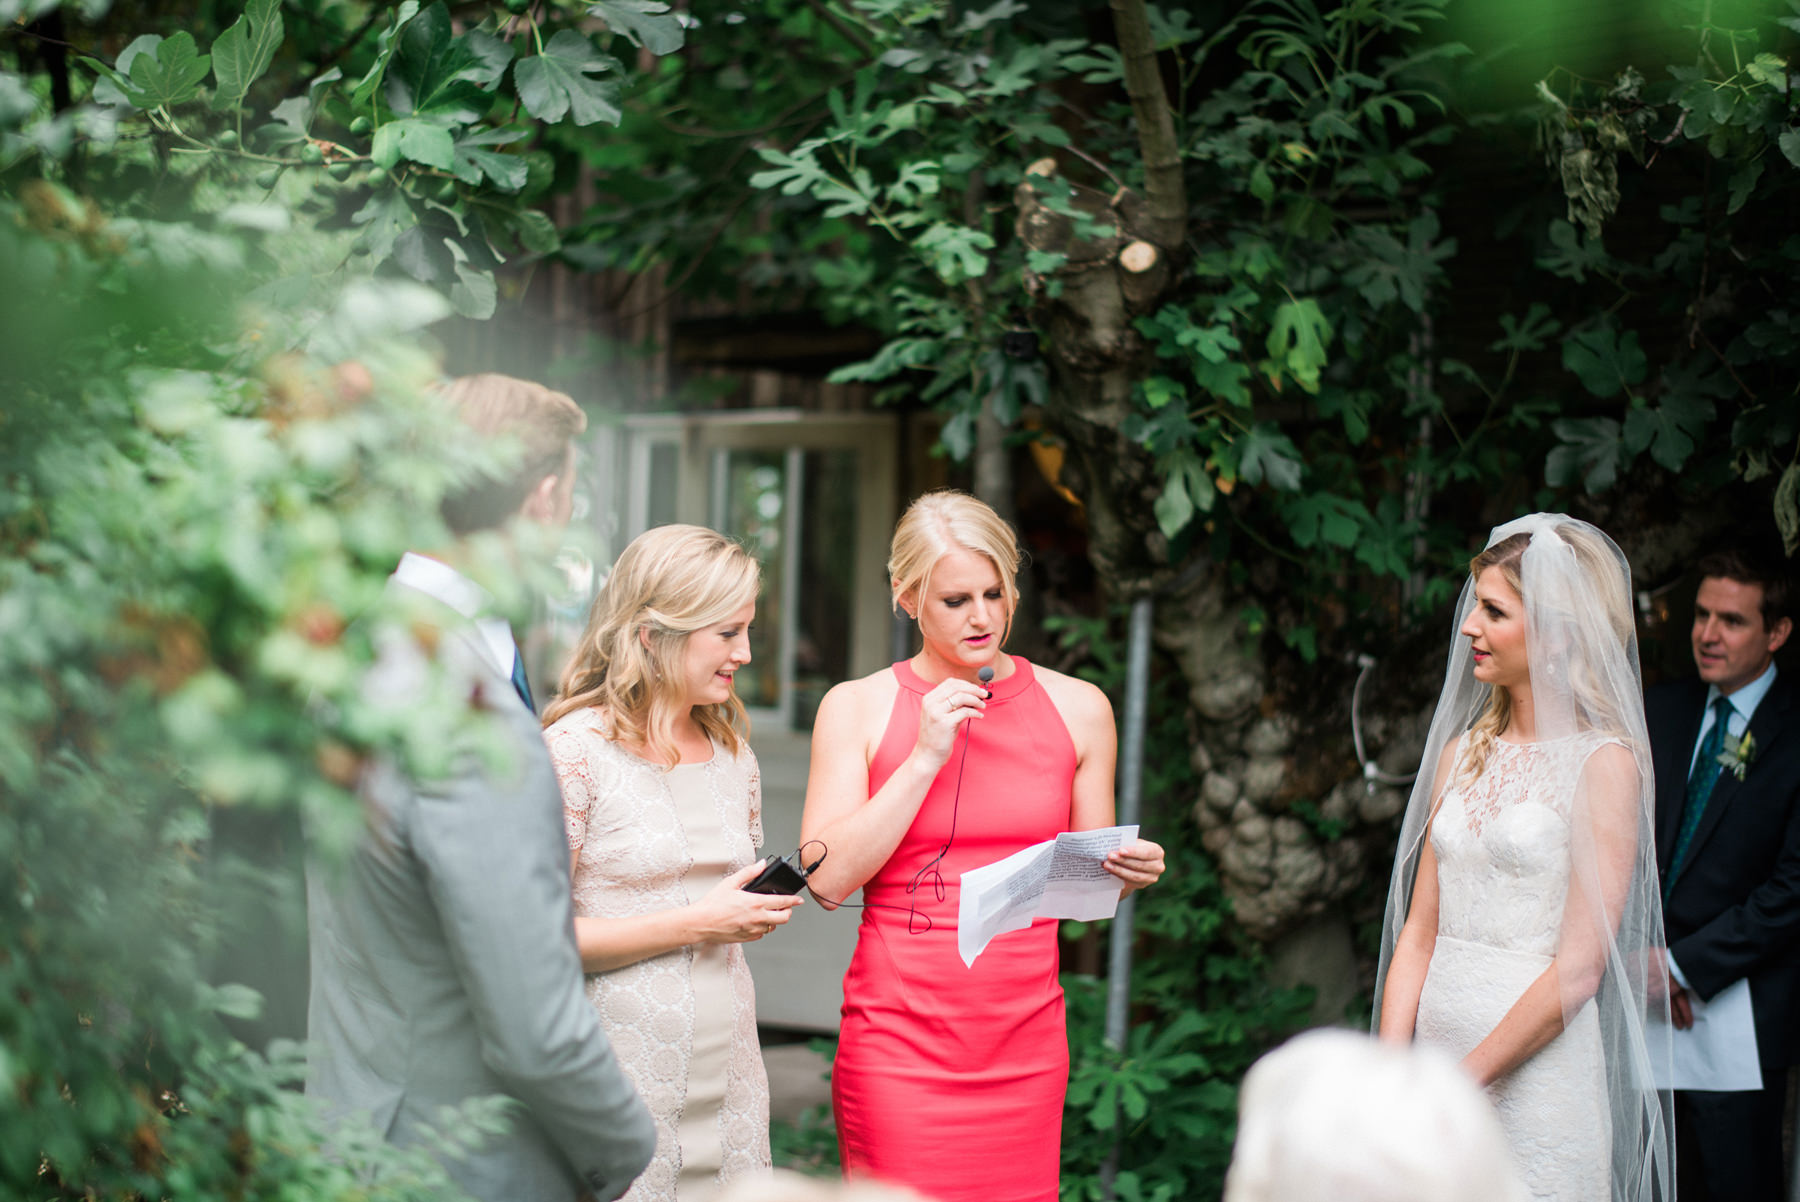 209-outdoor-wedding-ceremony-at-the-corson-building.jpg